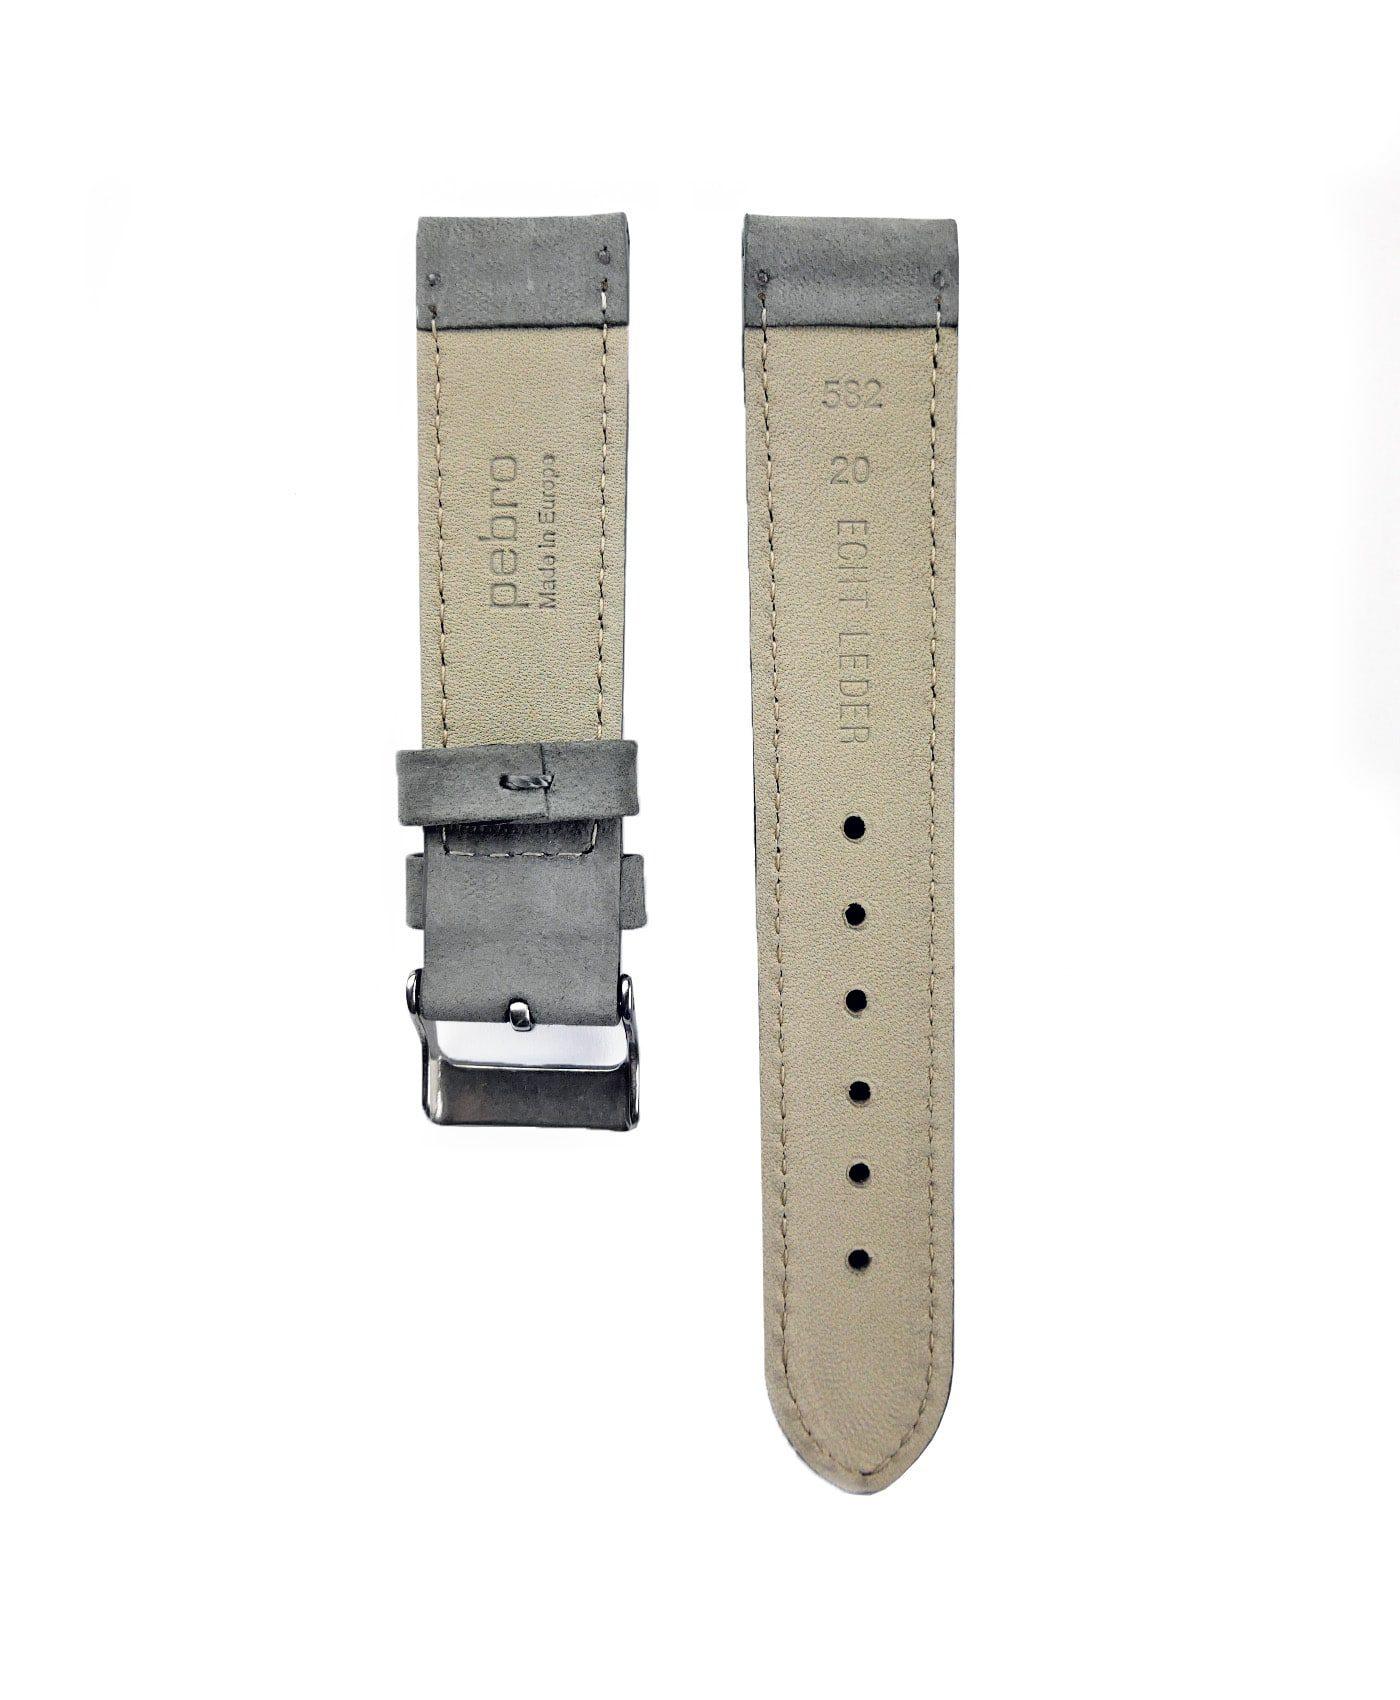 Pebro Premium Calfskin Watch Strap Grey No 582 back